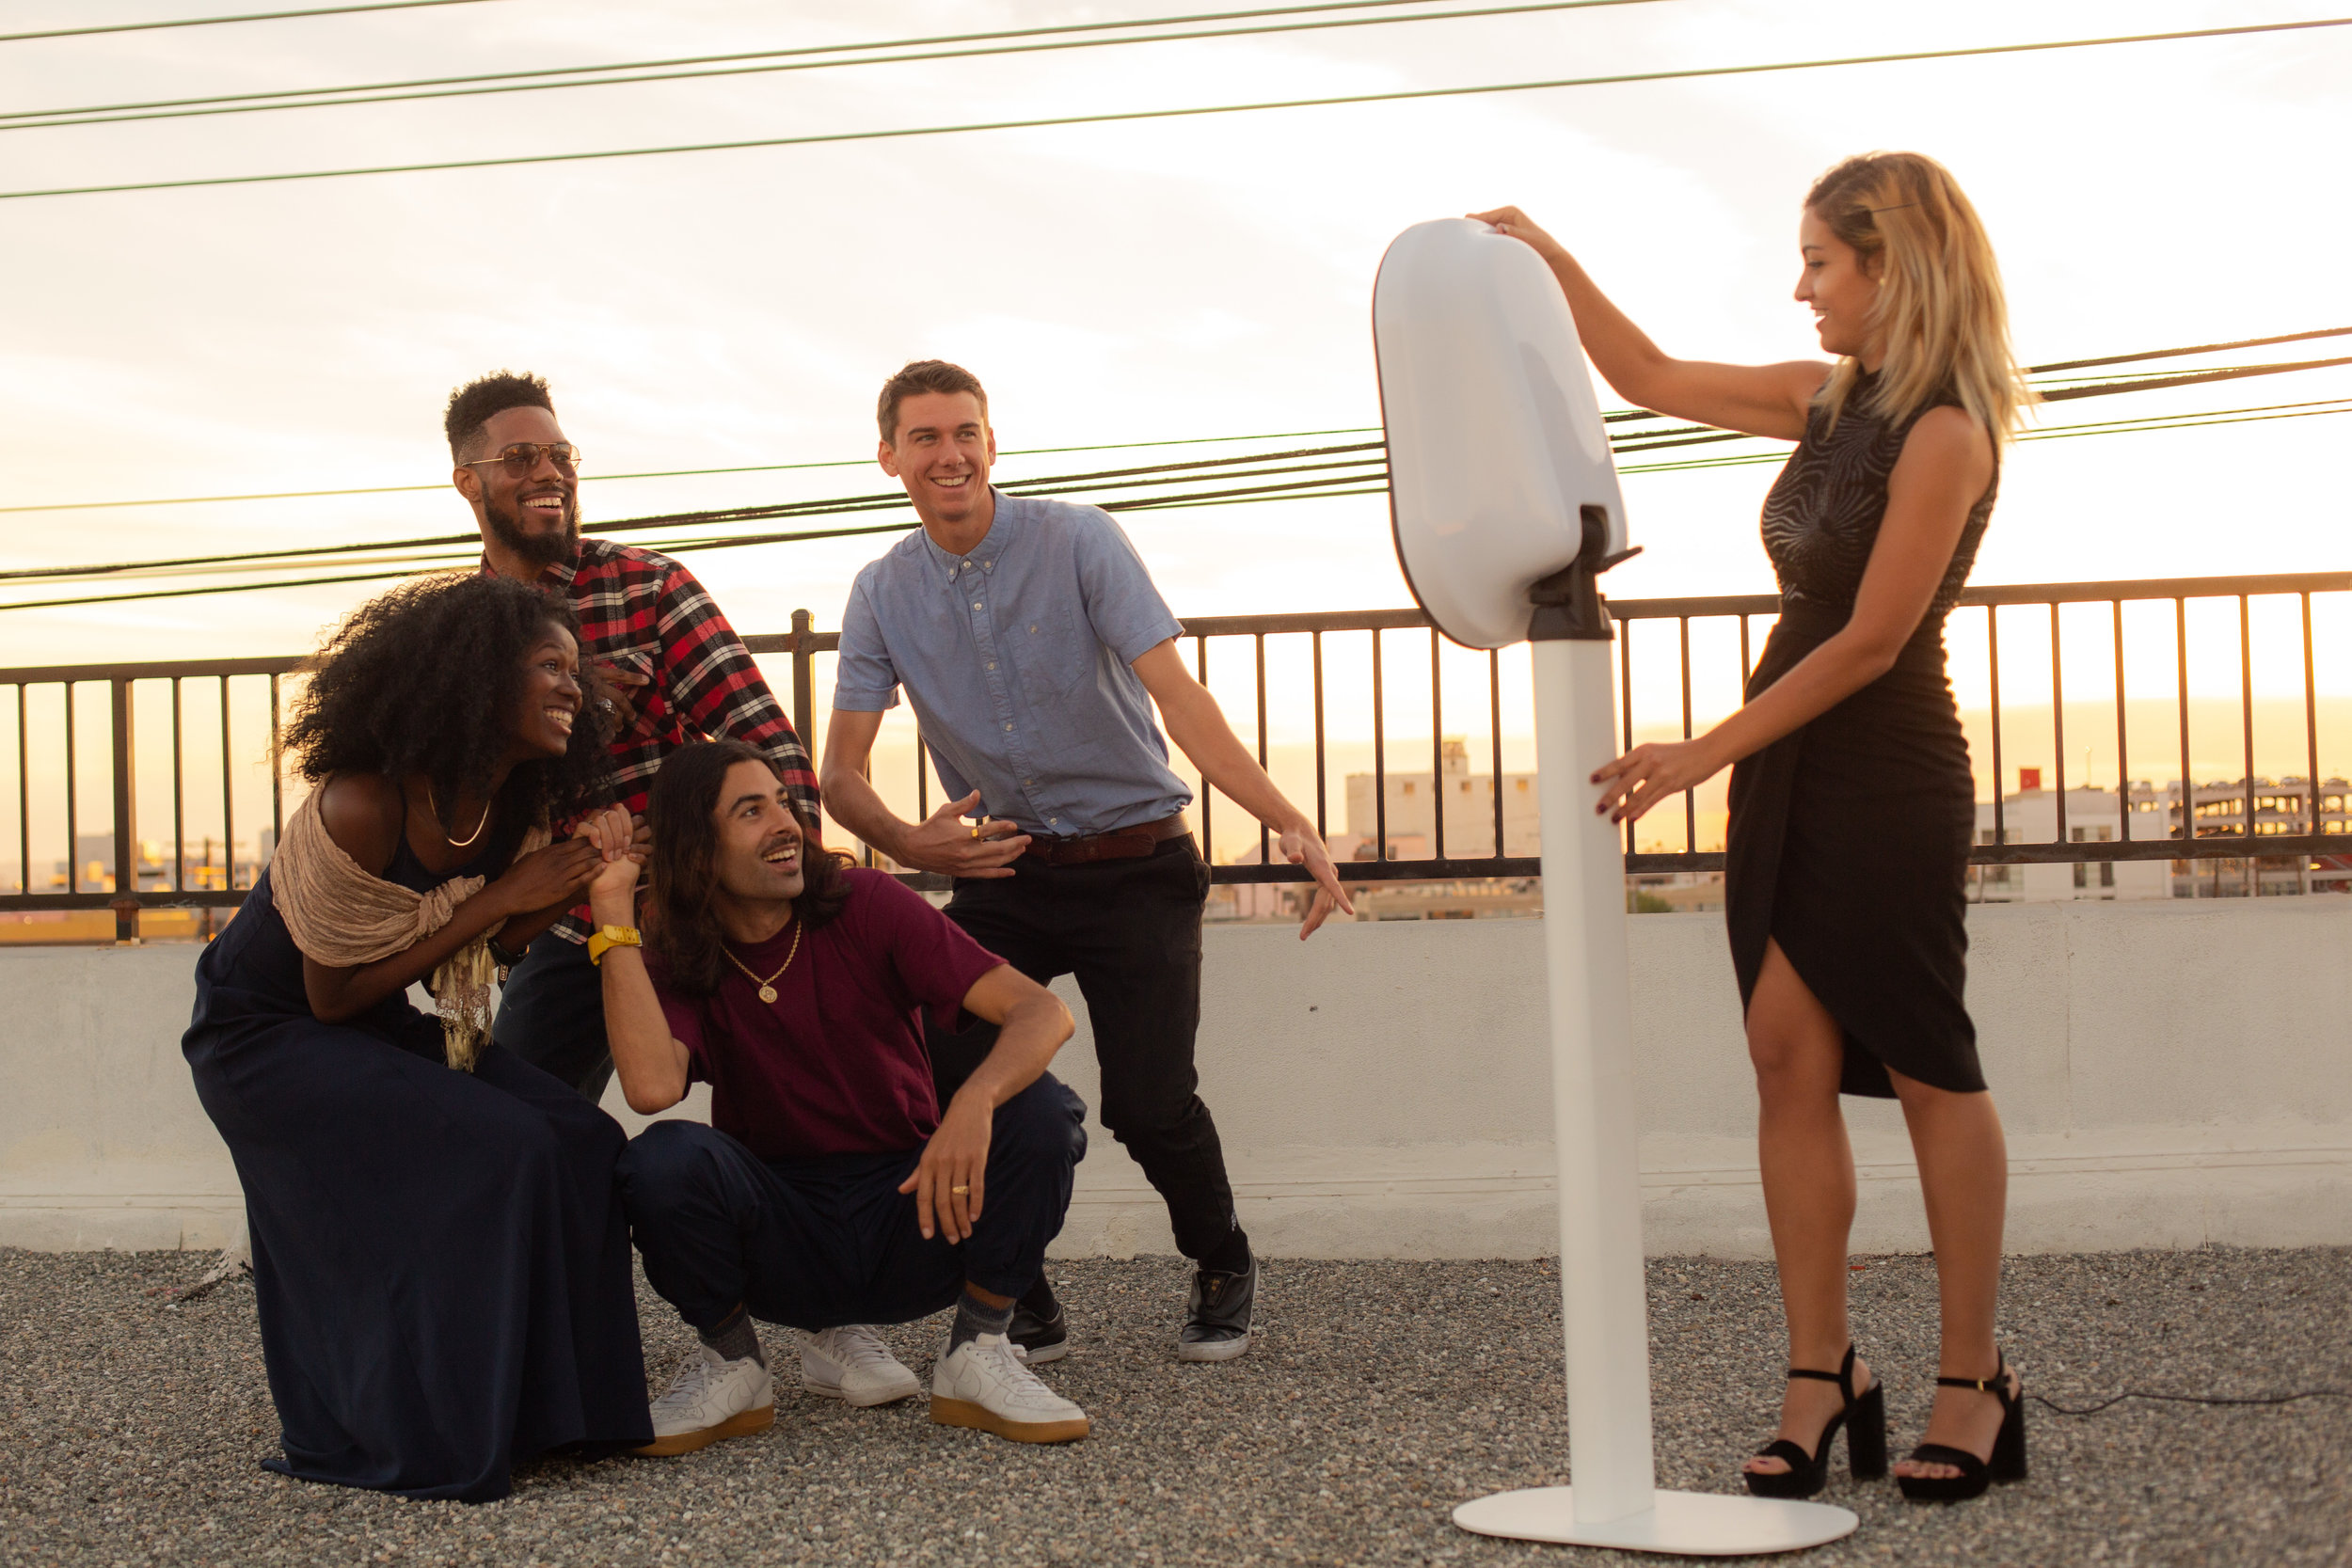 The Social Booth — NJ Photobooth Rental | Snapshot Photobooths